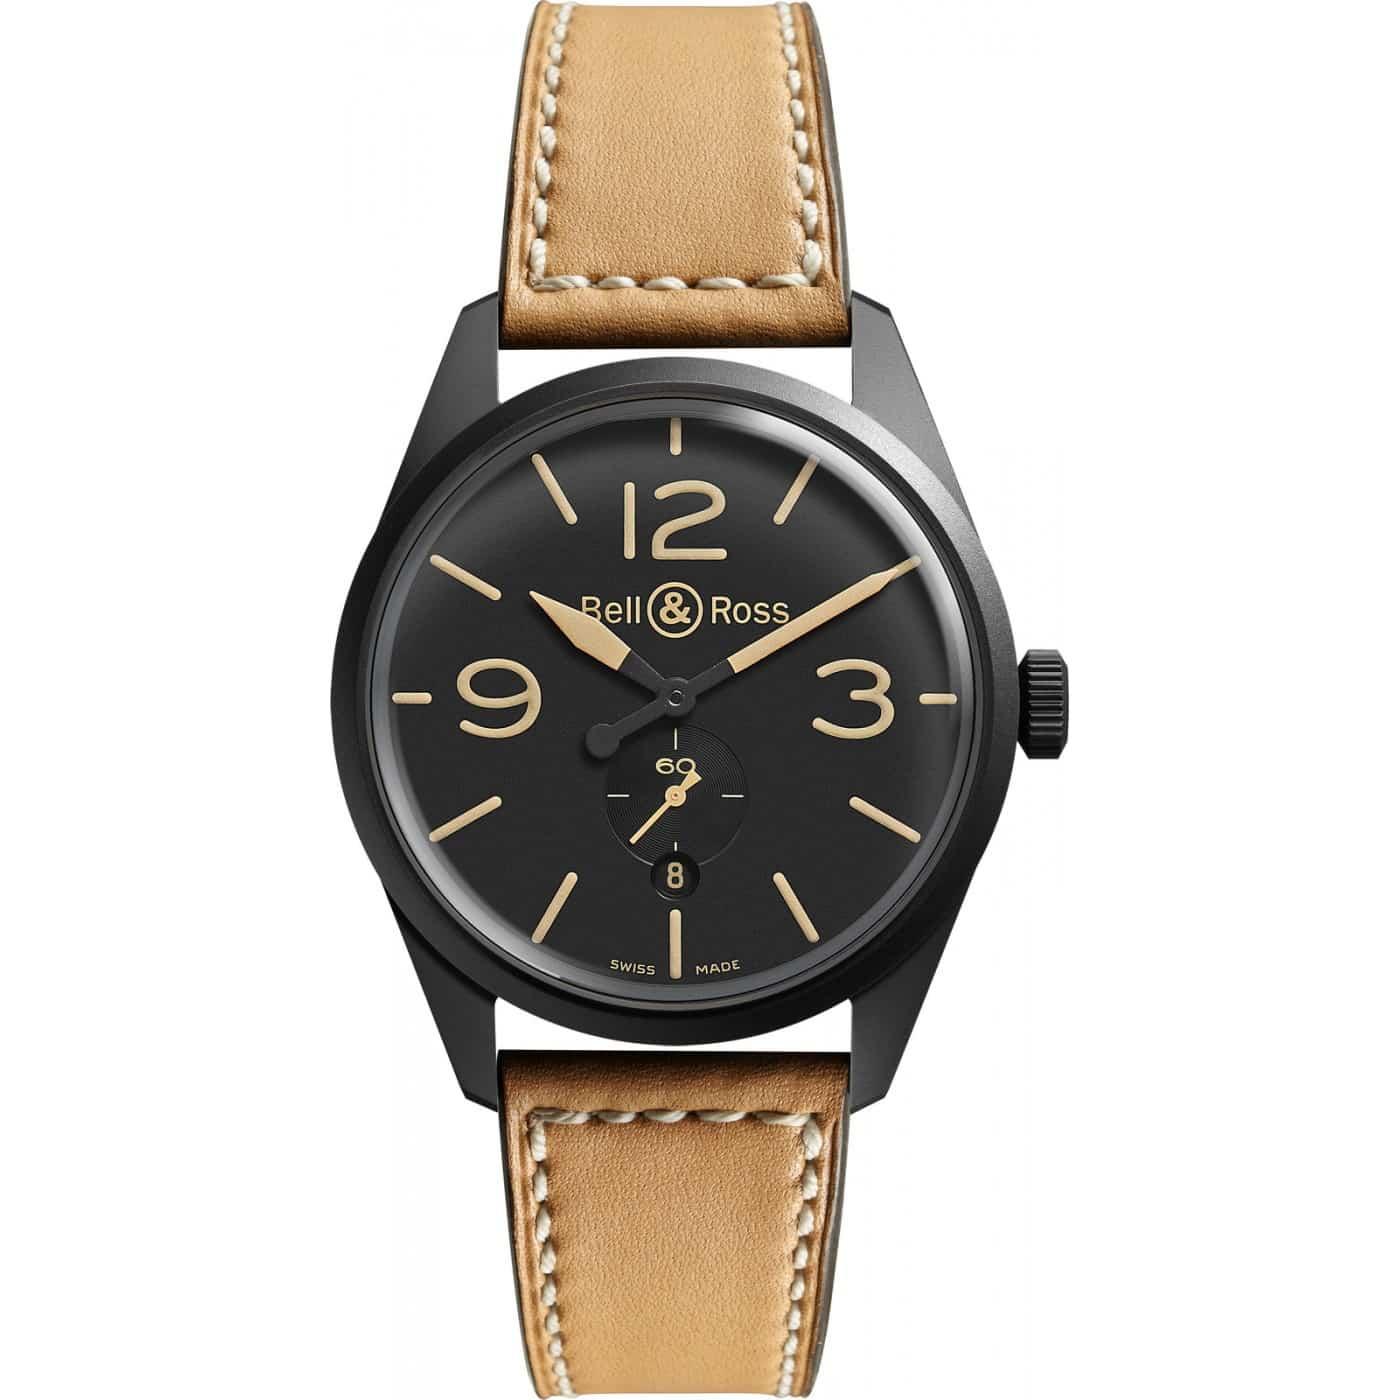 Bell & Ross 123 Heritage Watch